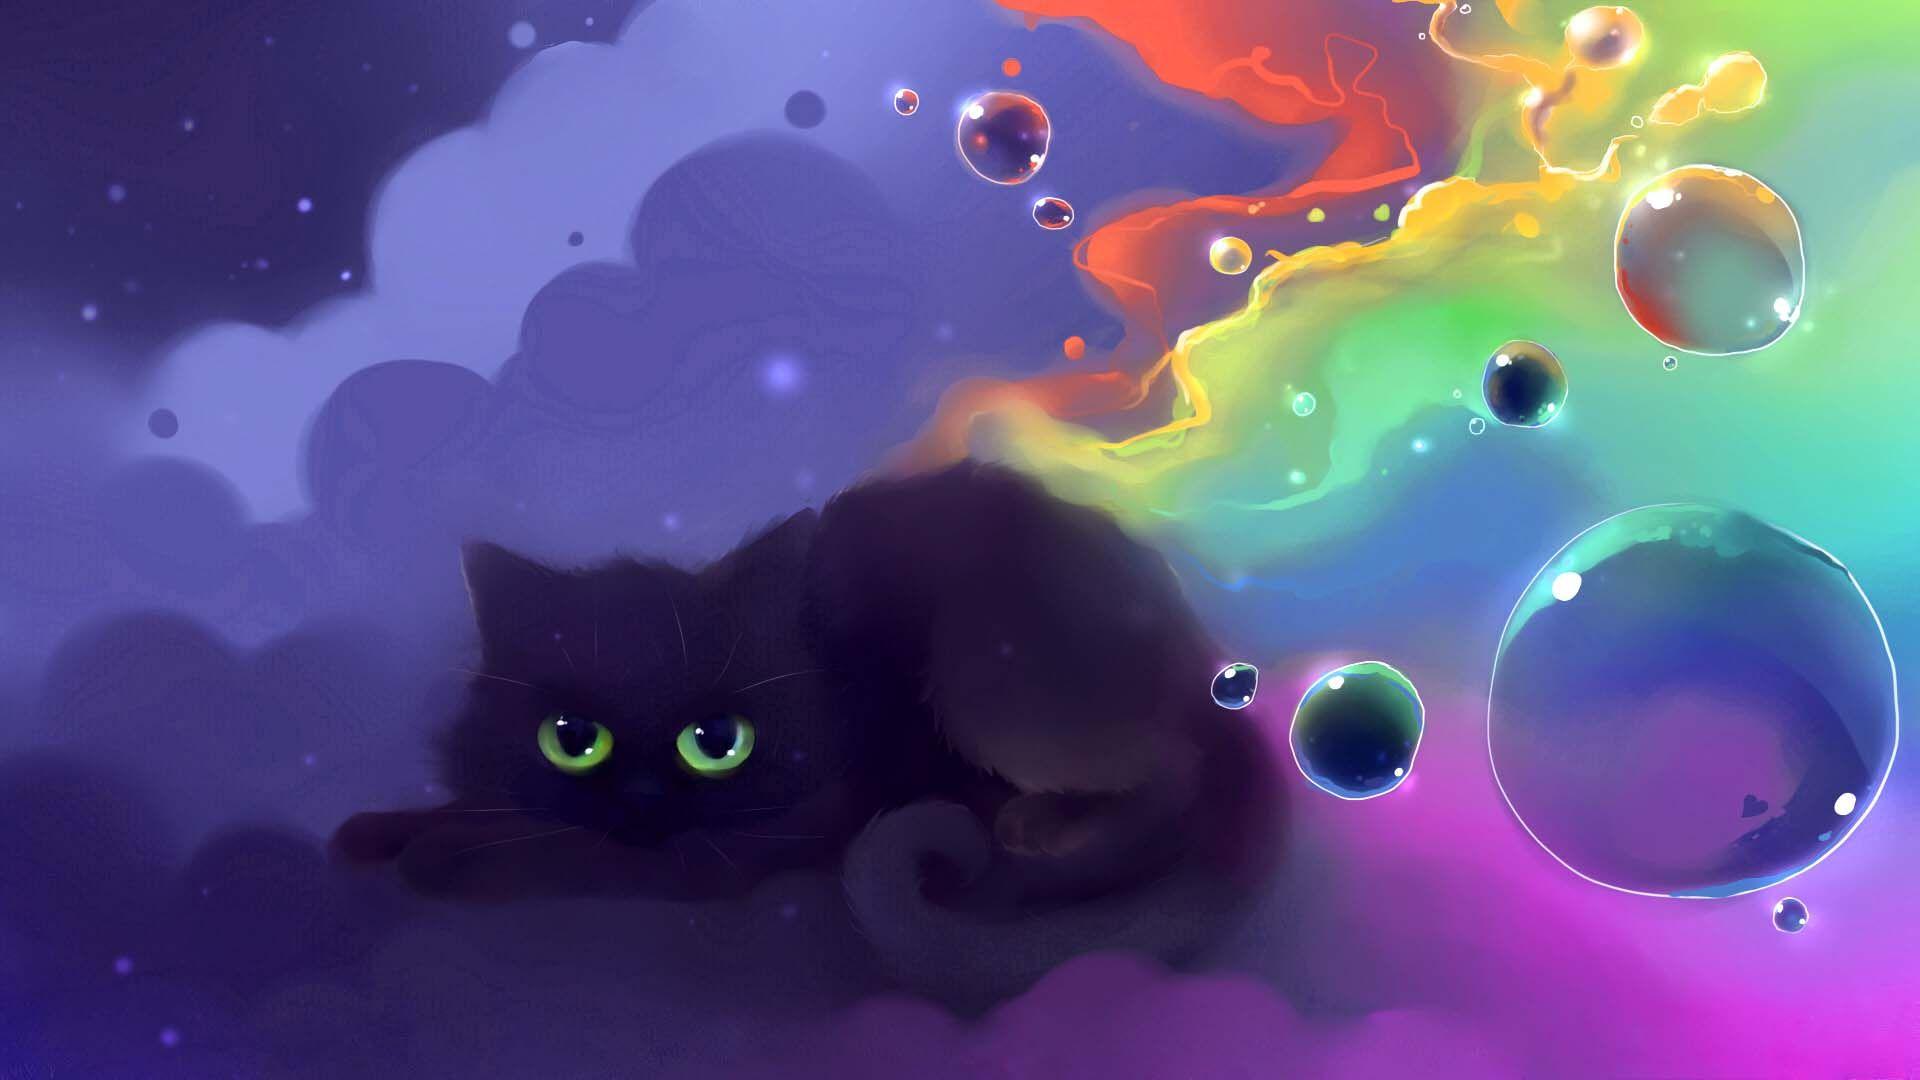 Download Warrior Cats Wallpaper, HD Backgrounds Download